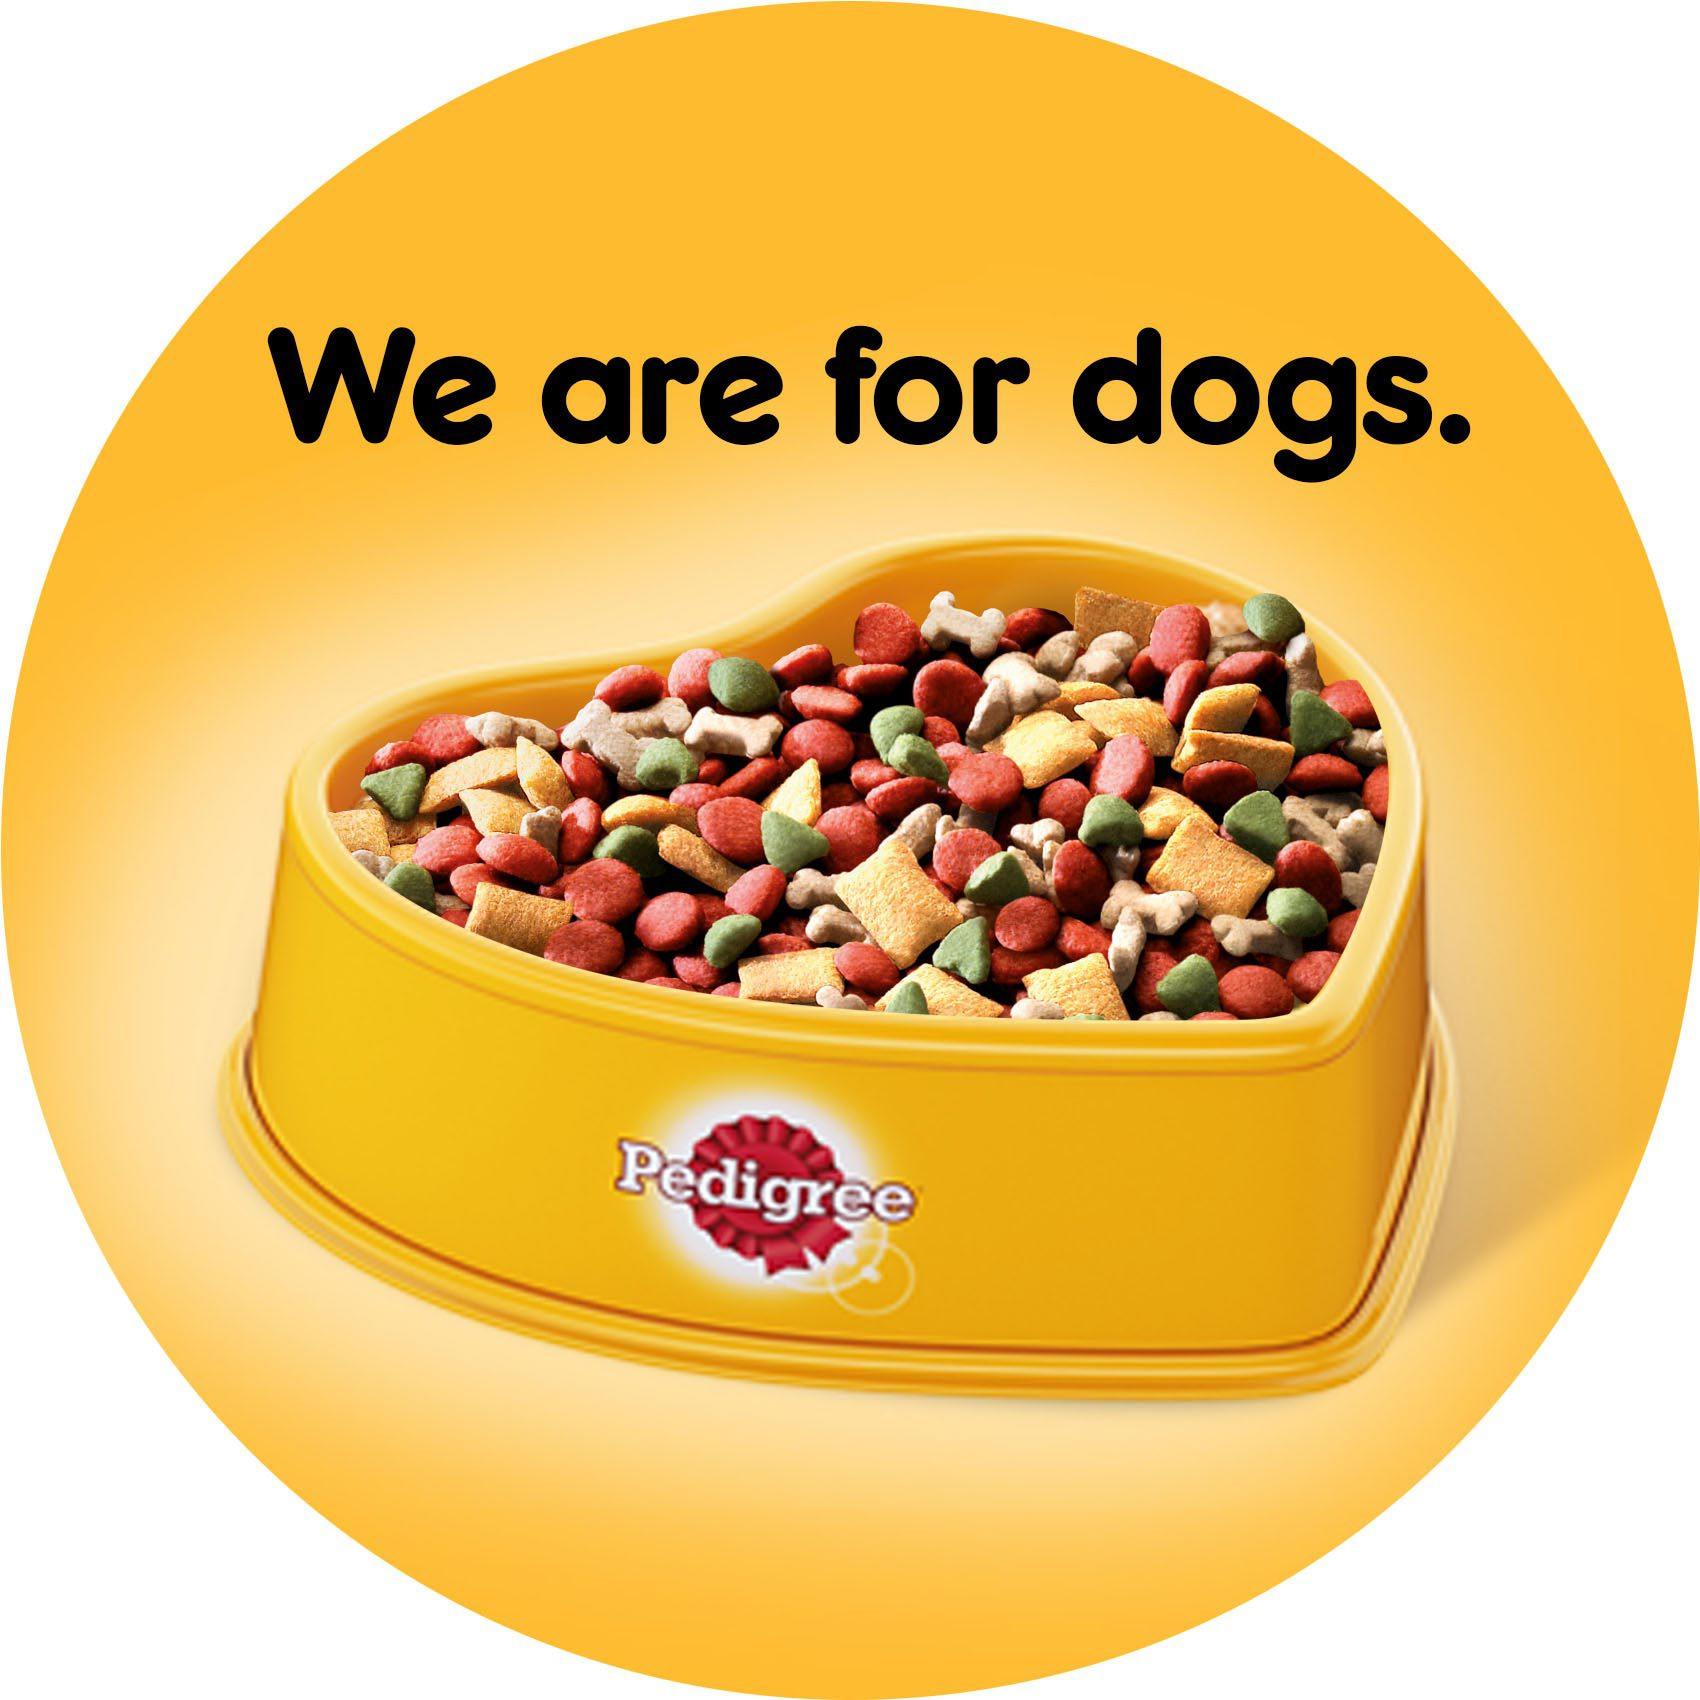 Buy Pedigreereg Chicken Amp Vegetables Dry Dog Food Adult 10kg Fancy Feast Grilled Tuna In Gravy 85g 6 Pcs Free Pouch Pedigree Liver